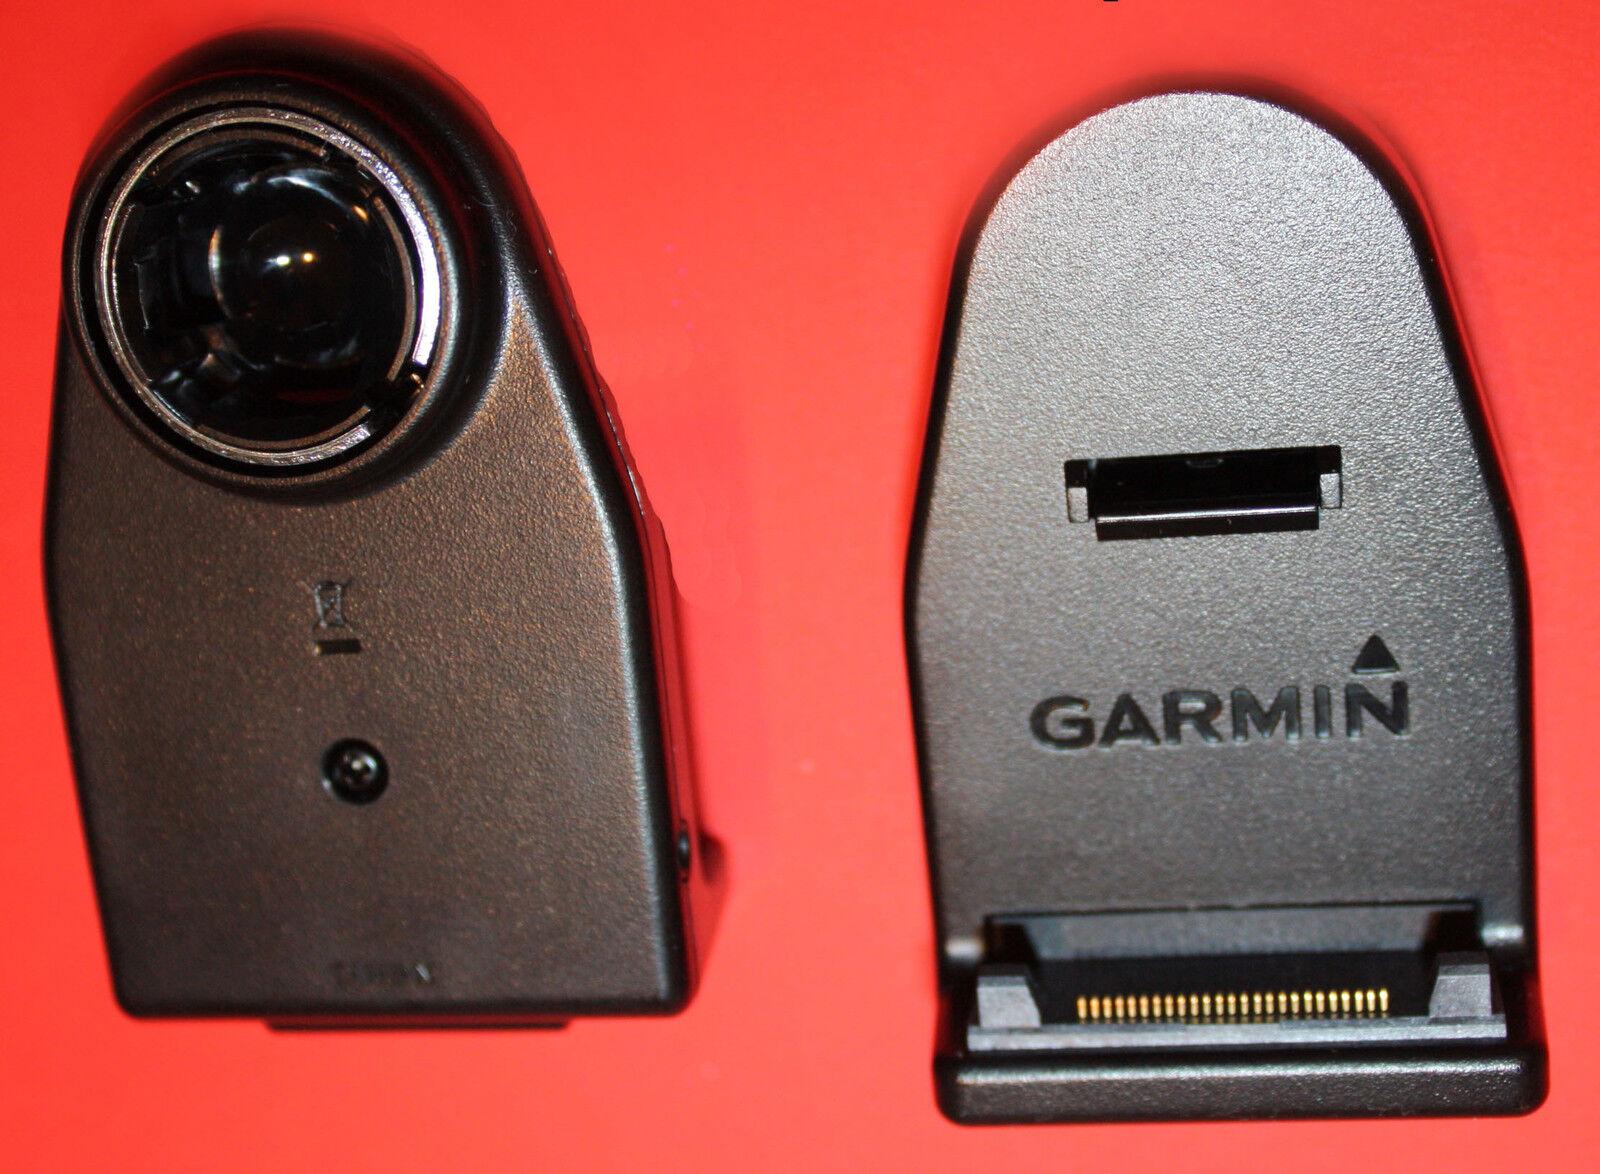 Garmin Nuvi Mount/clip/ 760 765t 700, 710, 785t Gps Holder Adapter